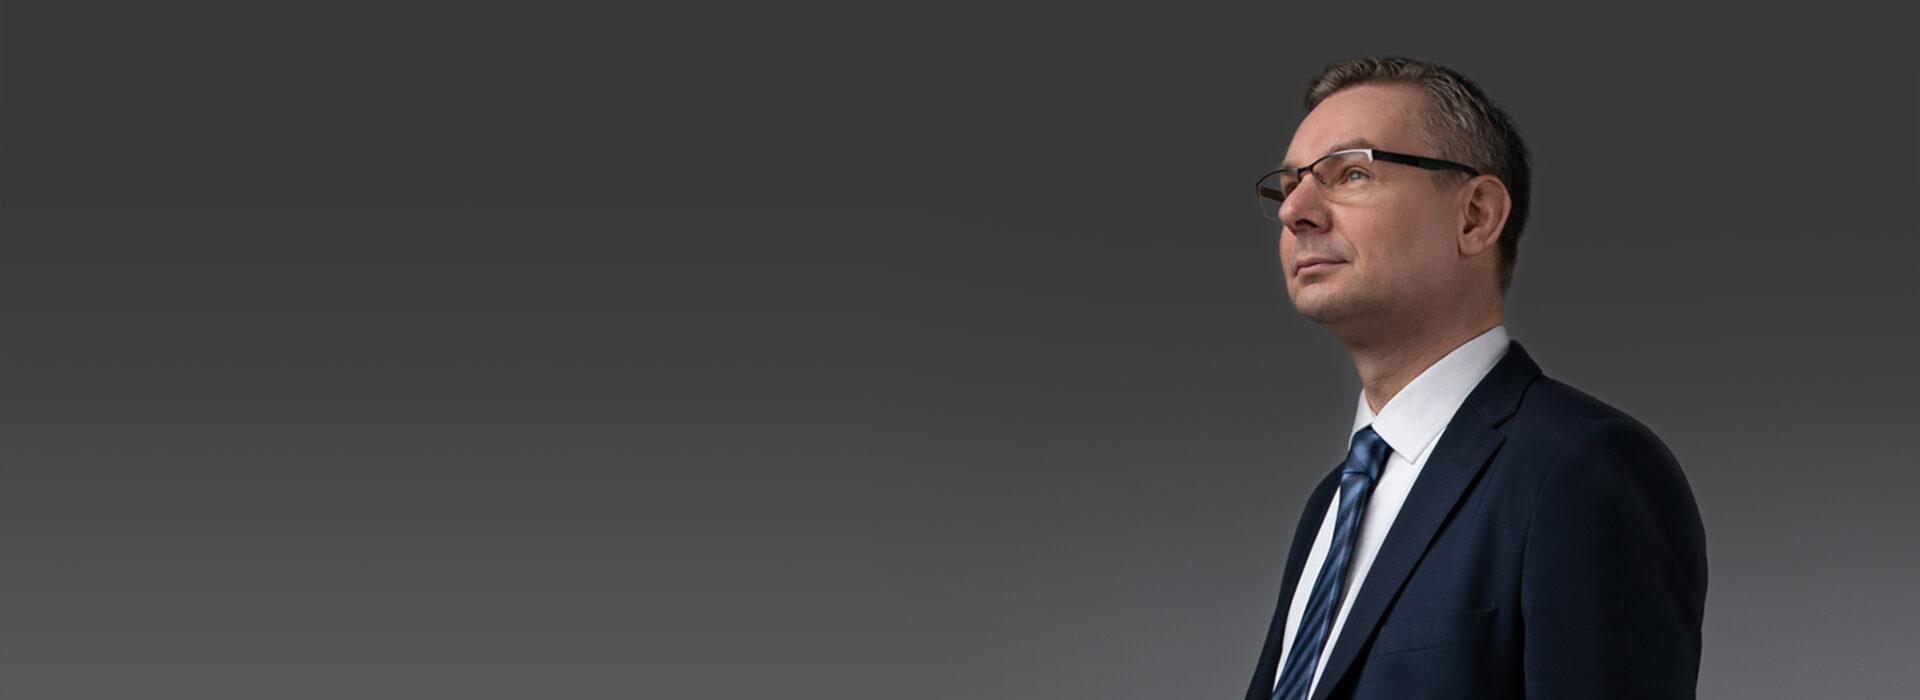 Timo Ala-Heikkila